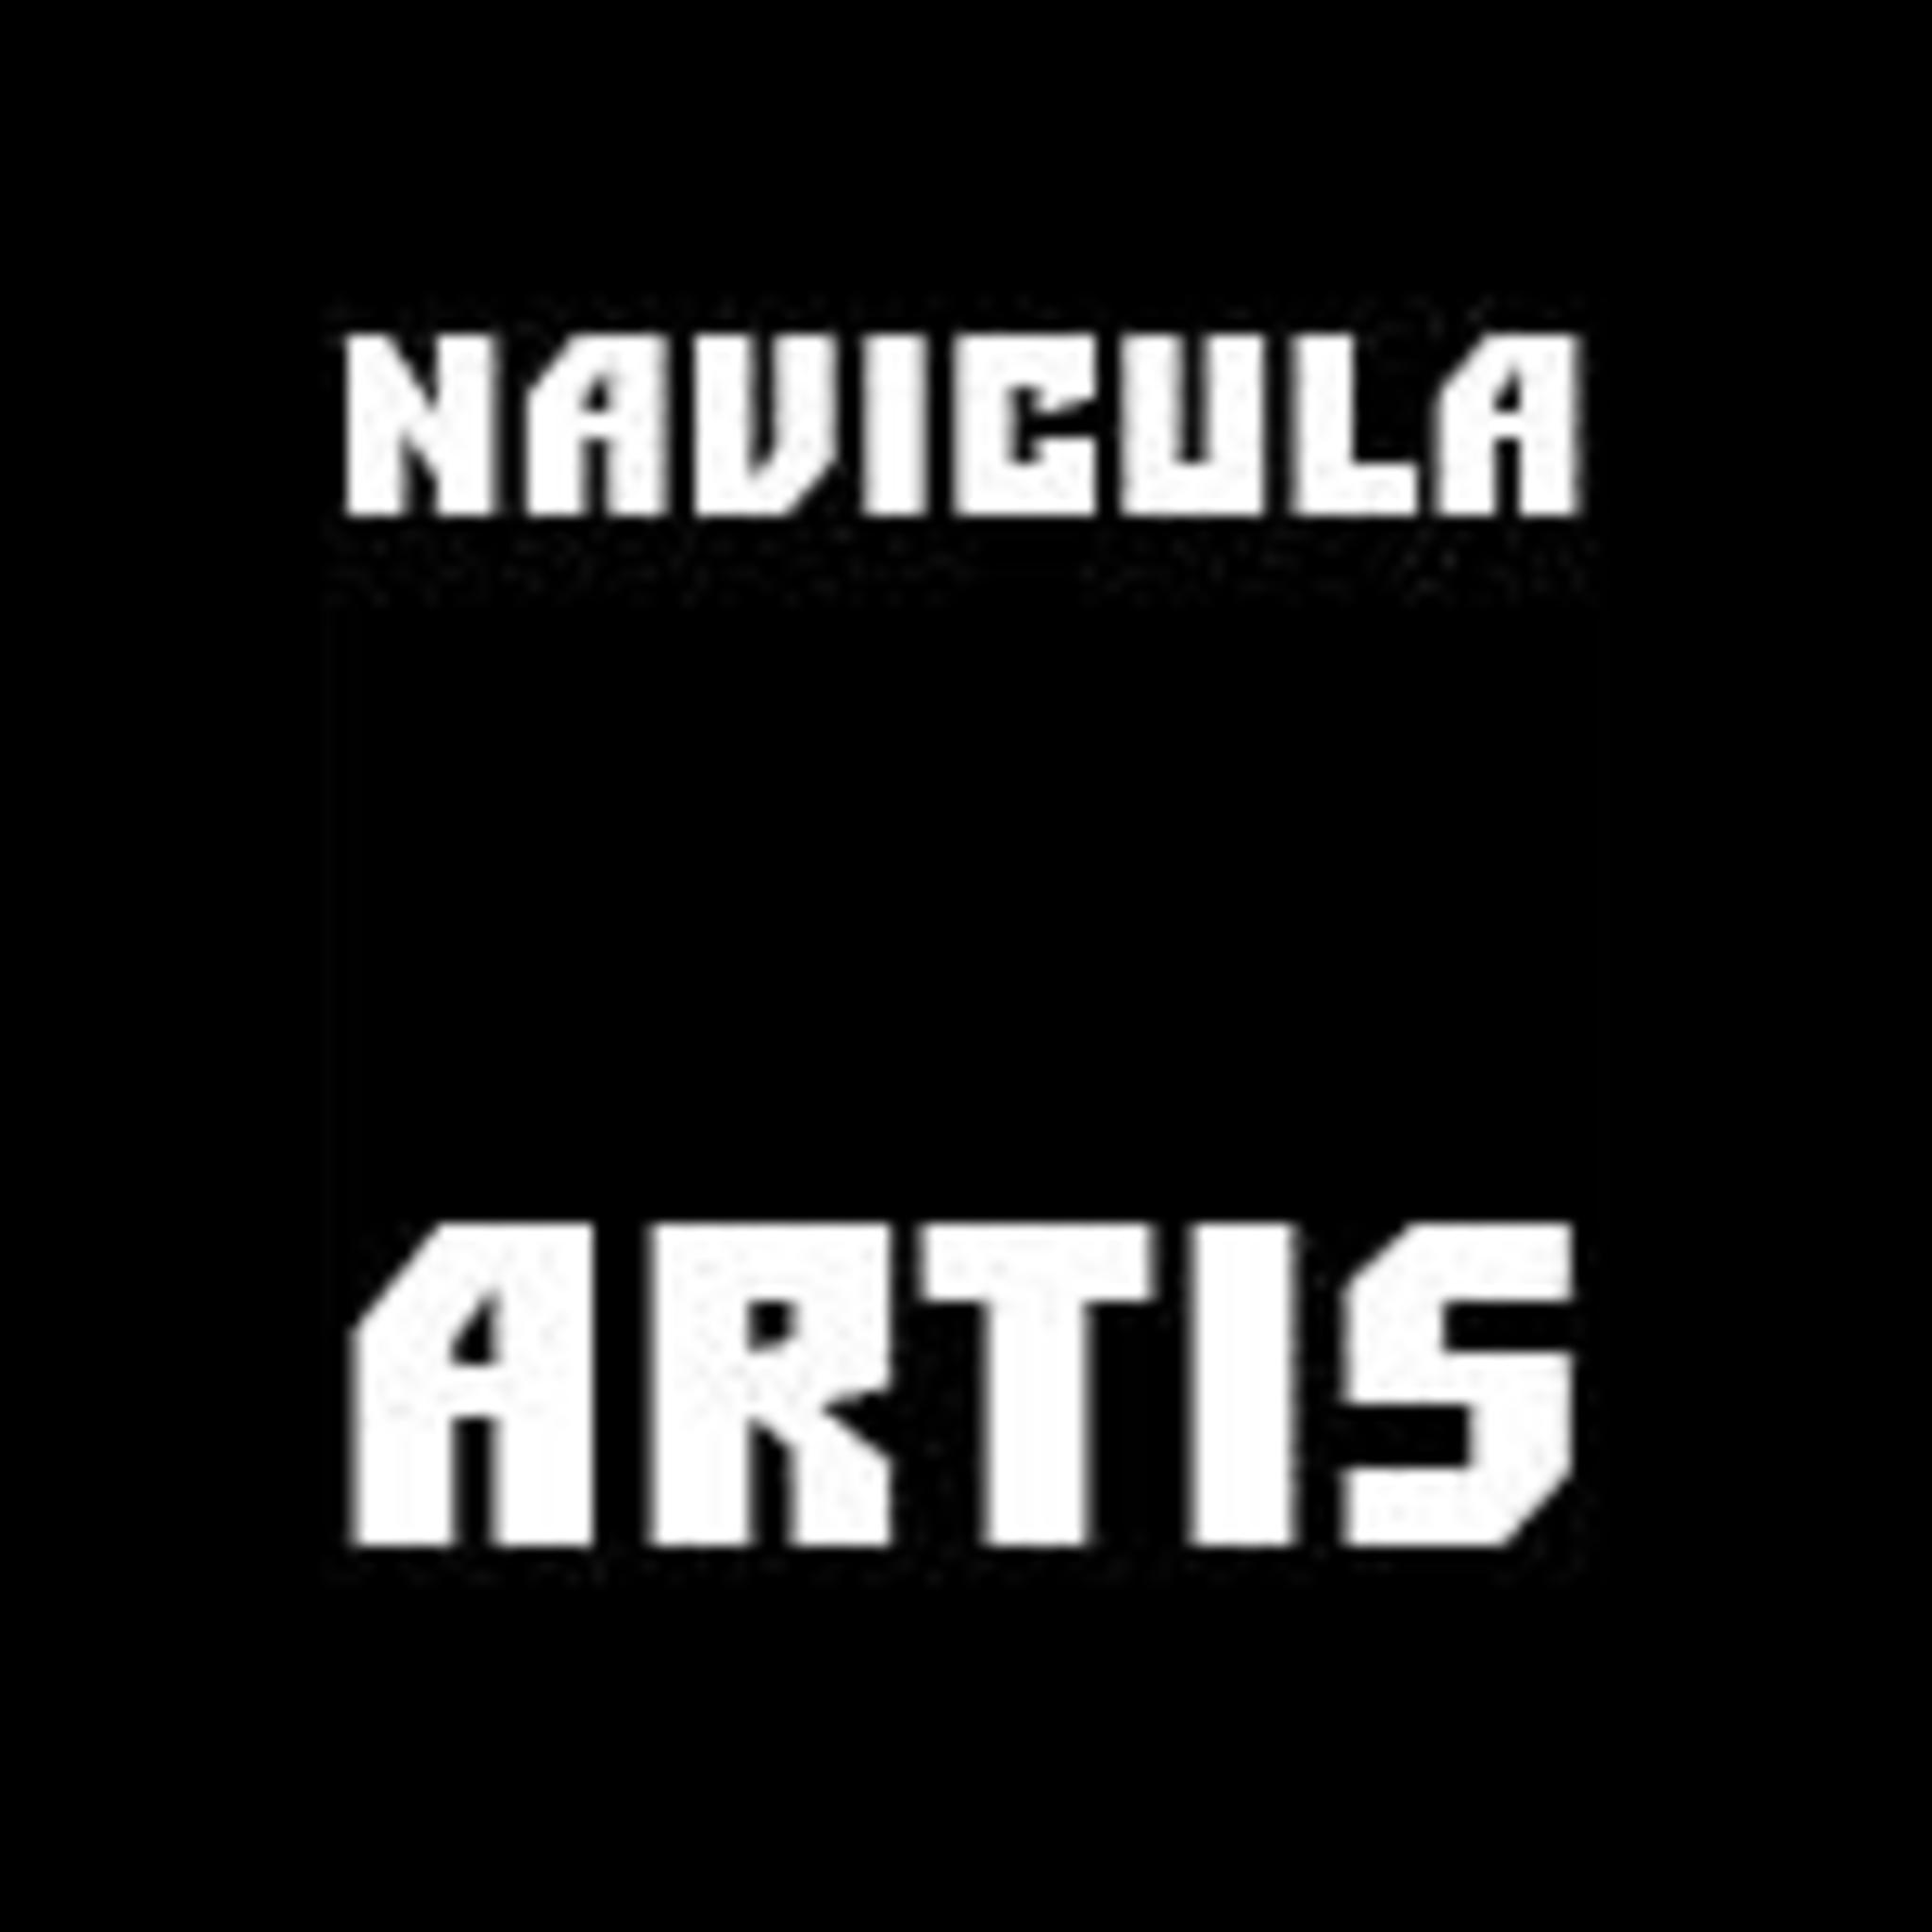 Галерея Navicula Artis